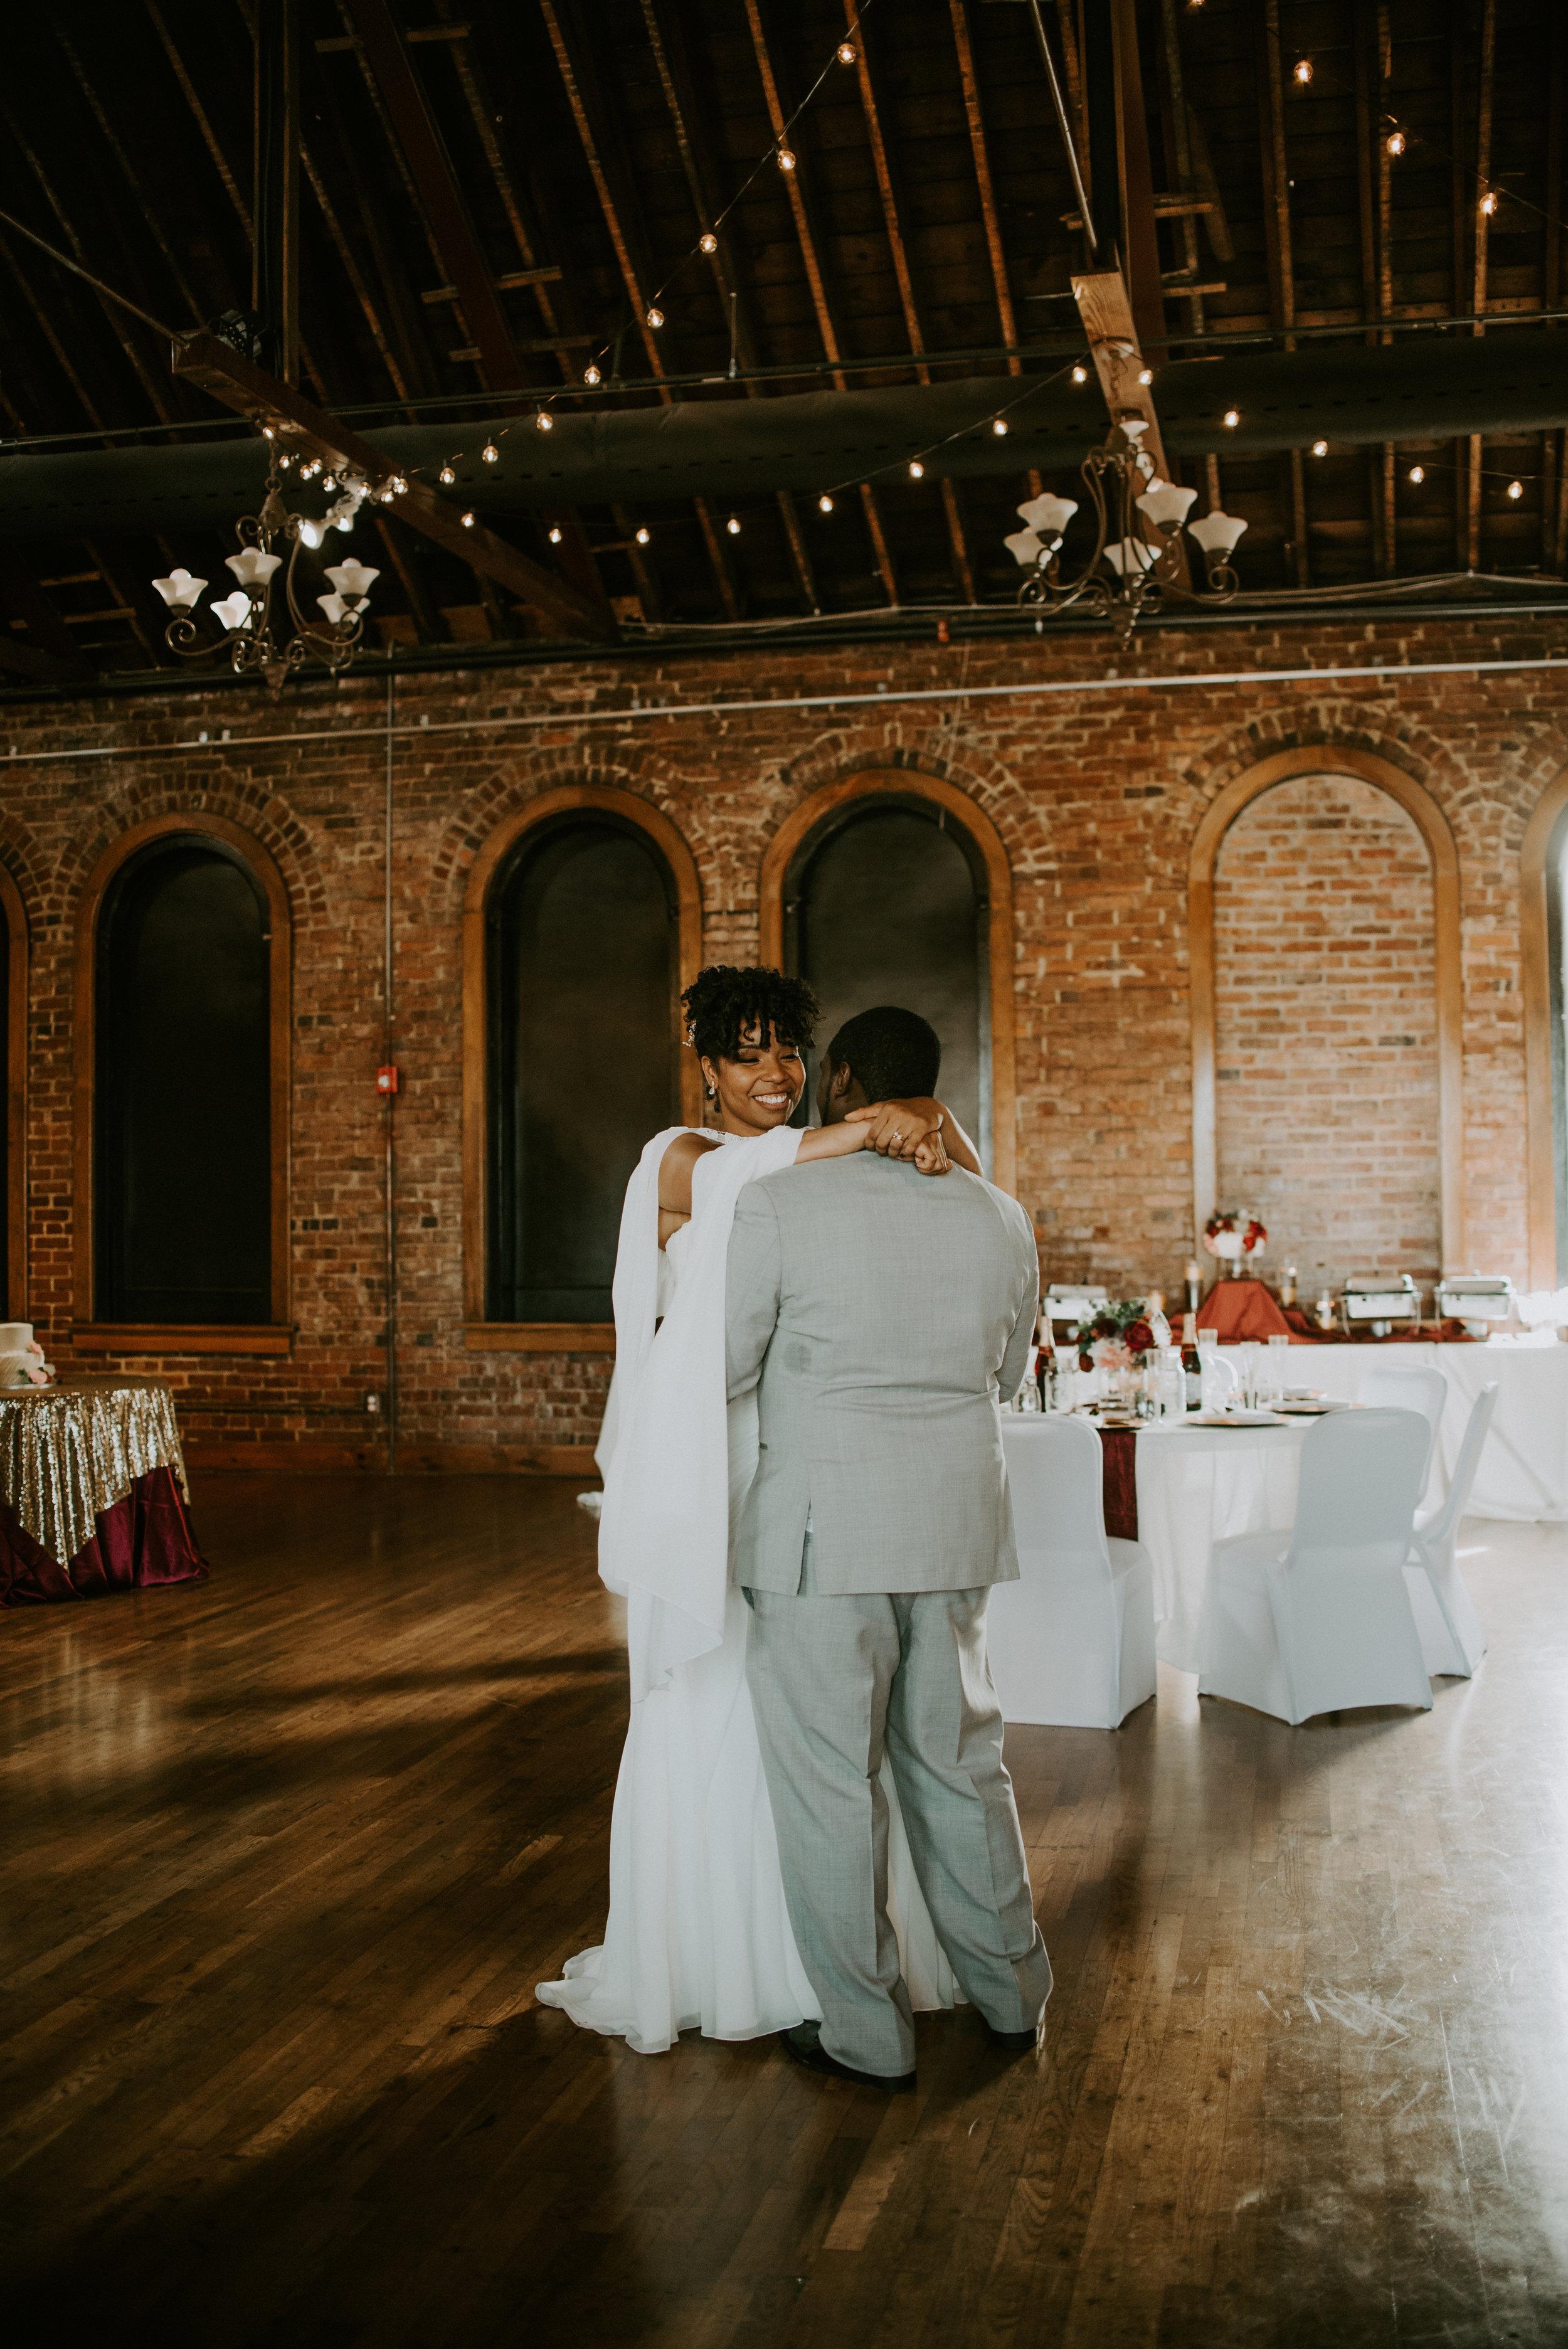 WonderlyCreative_Wedding_6.7.18_Khara&Dwayne_-831.jpg